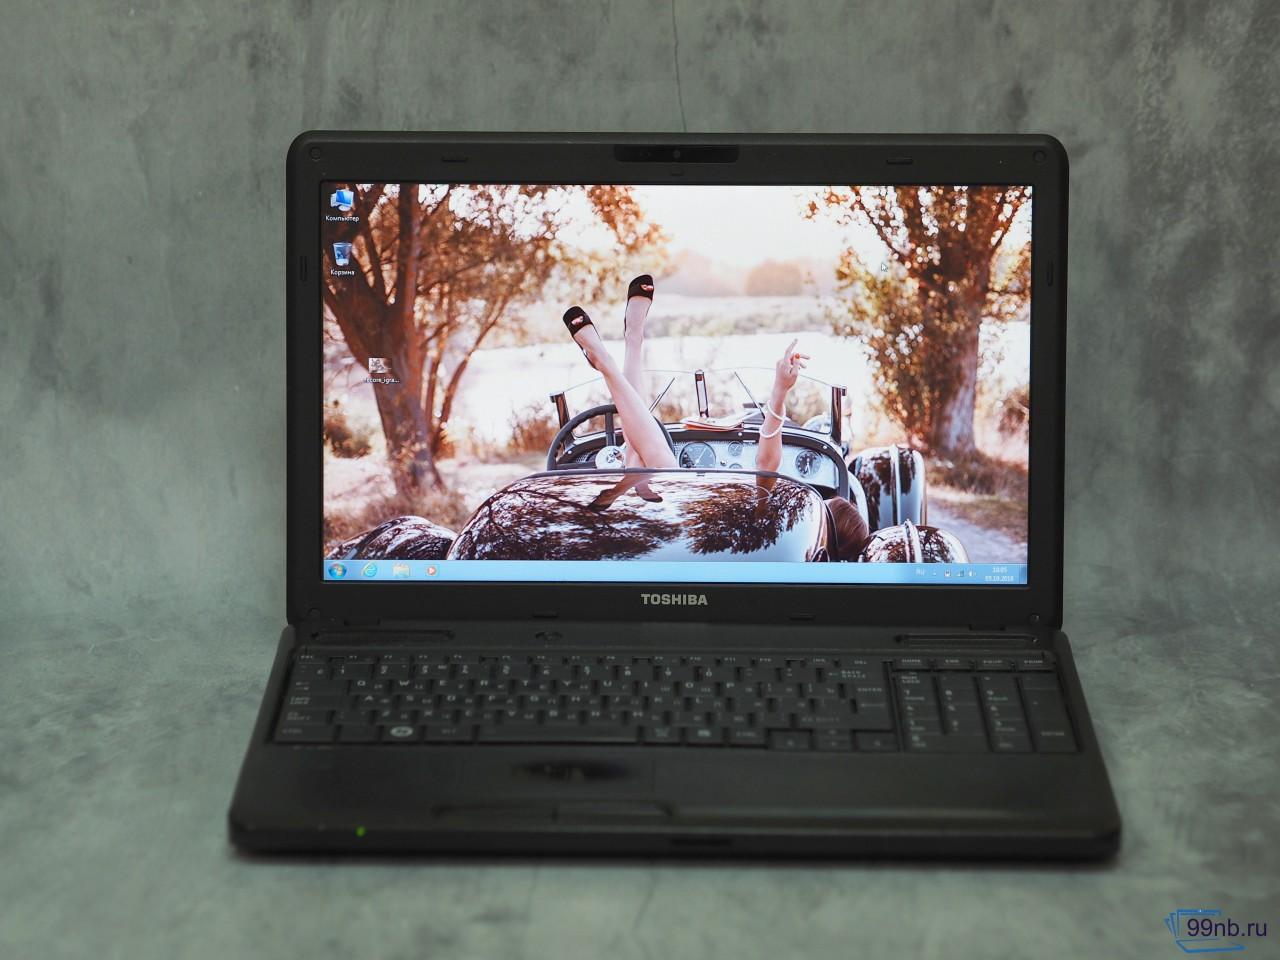 Toshiba Core i3